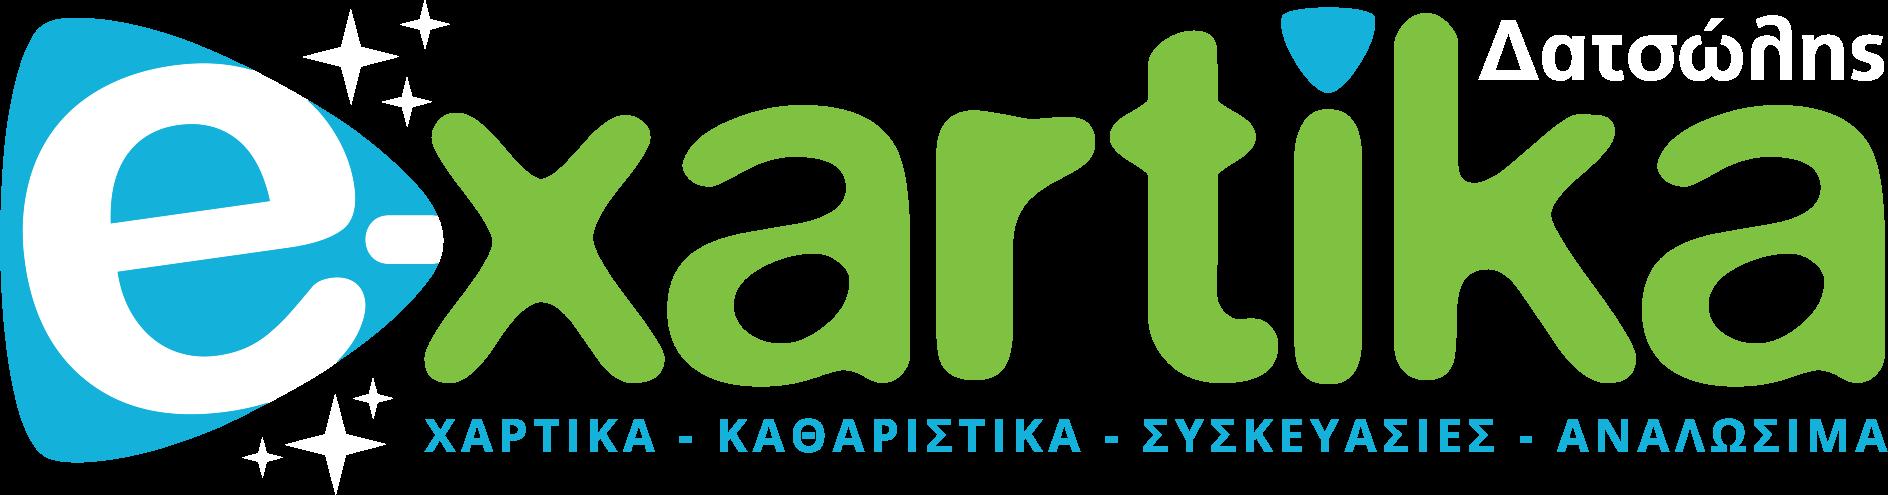 e-xartika | Χαρτικά-Καθαριστικά-Συσκευασίες-Αναλώσιμα